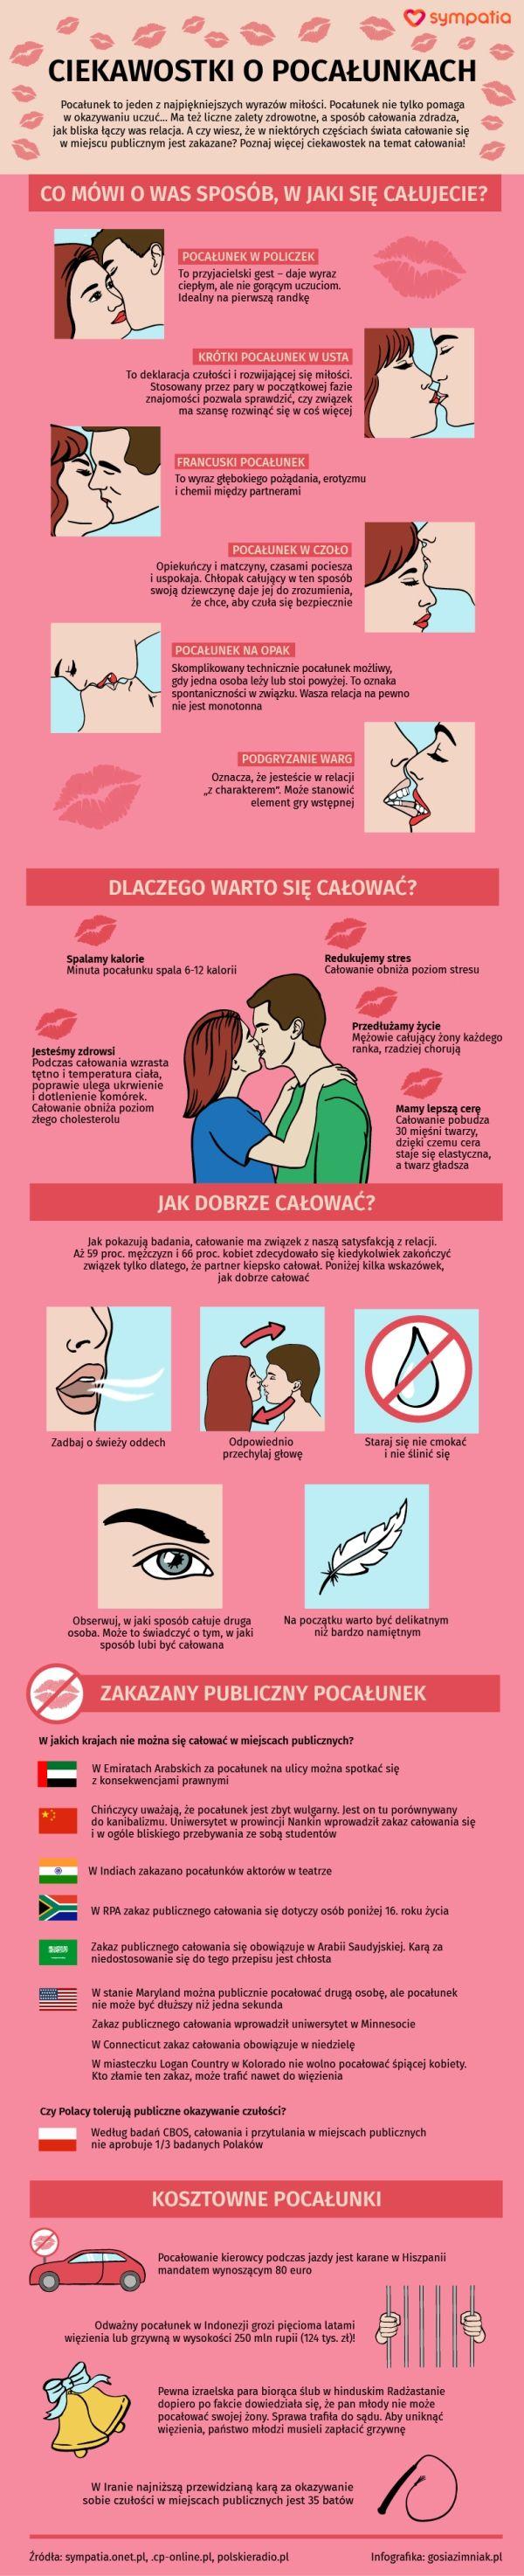 #infografika #infographic